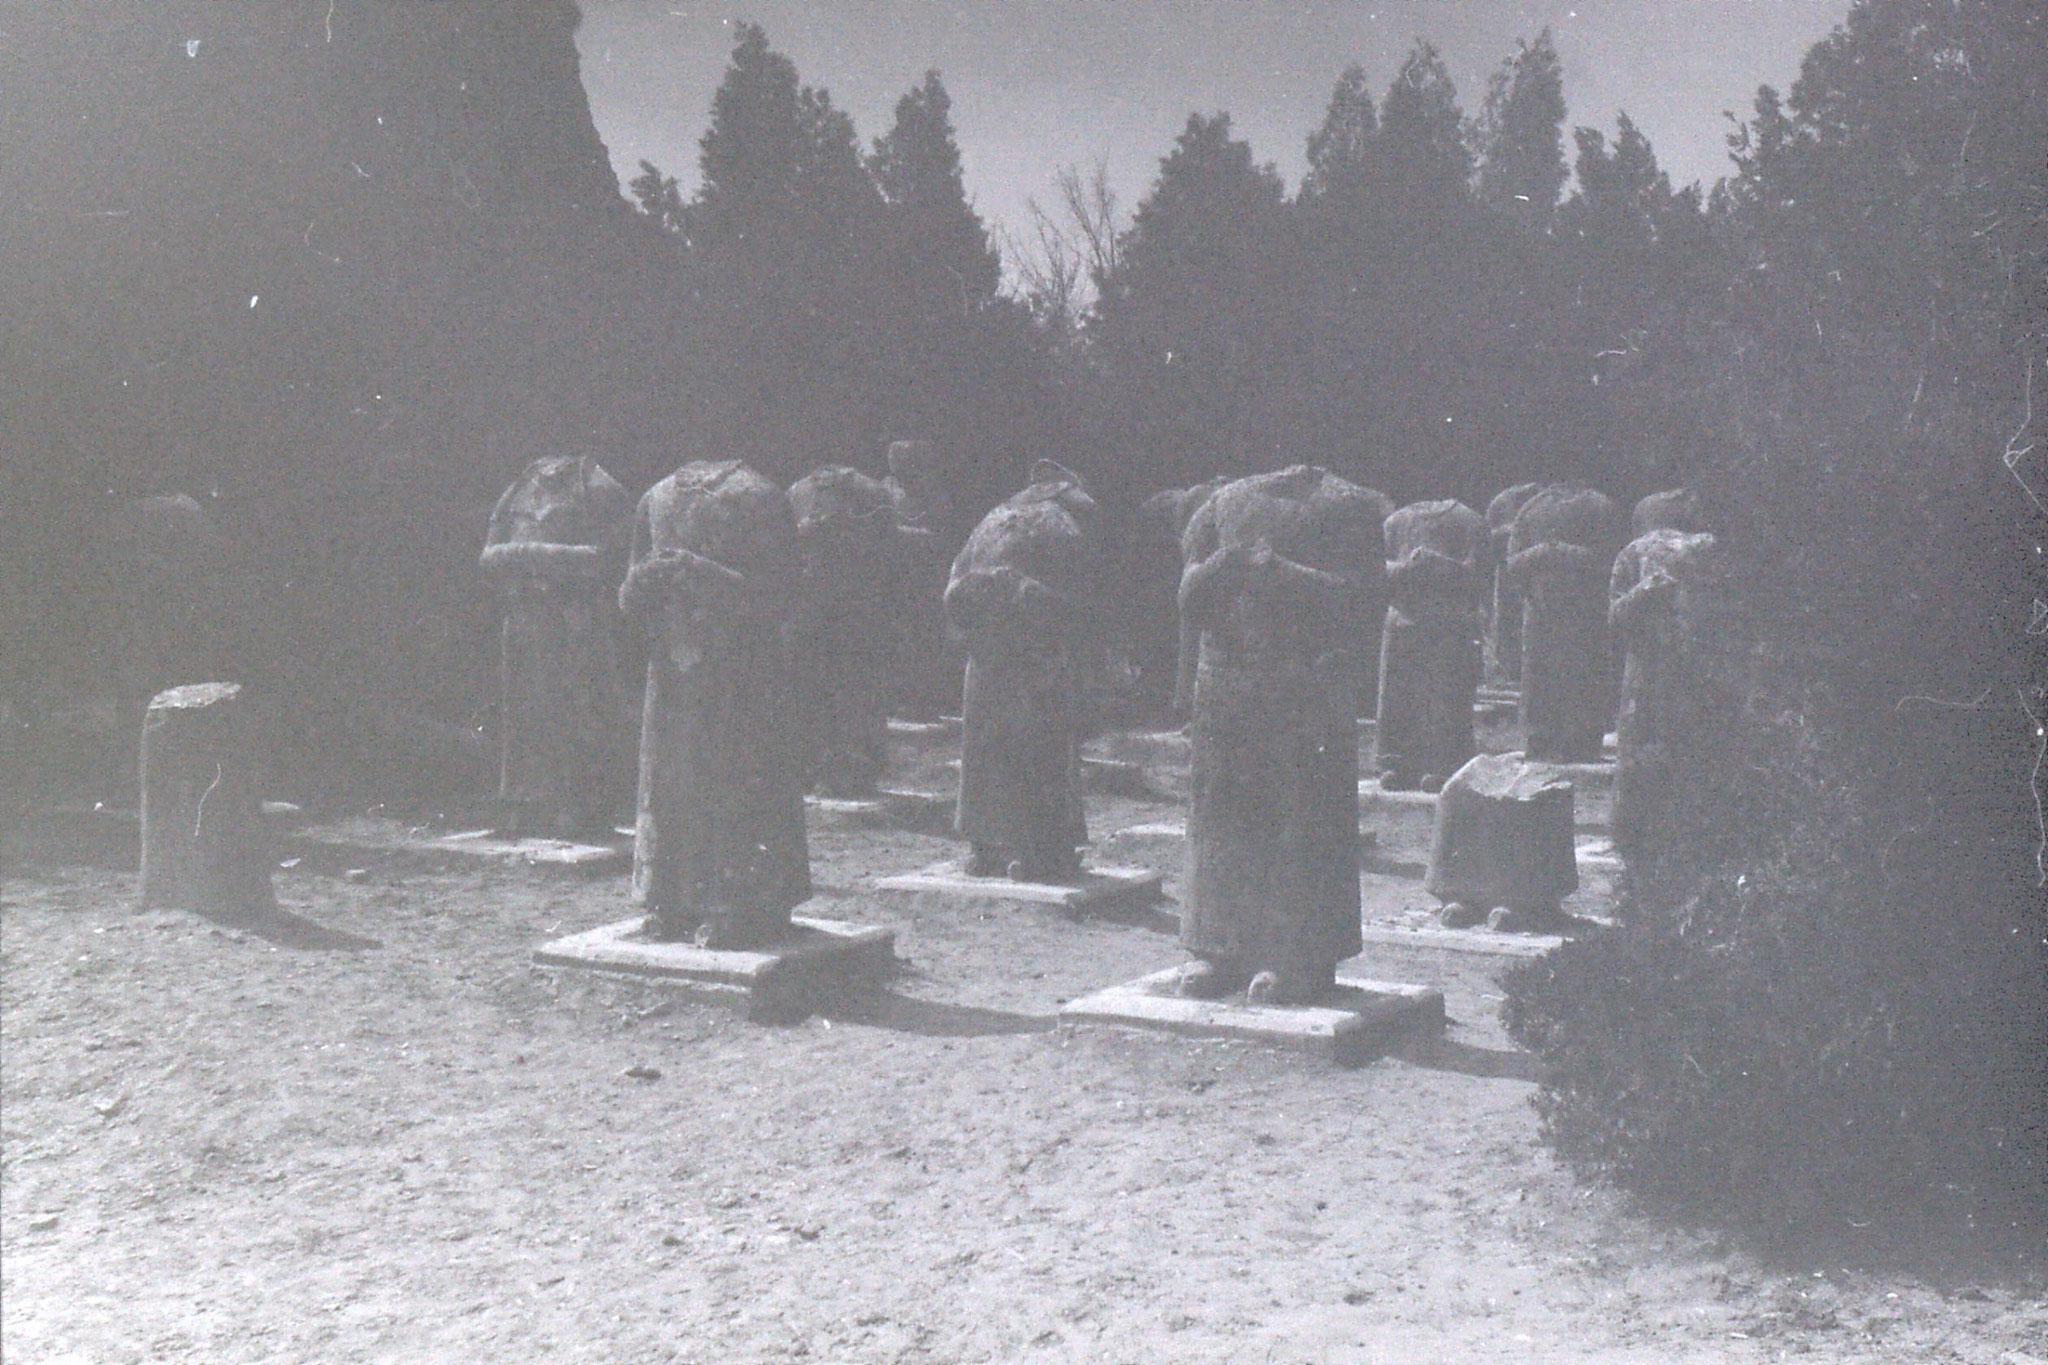 7/3/1989: 24: Xianyang 32 headless statues